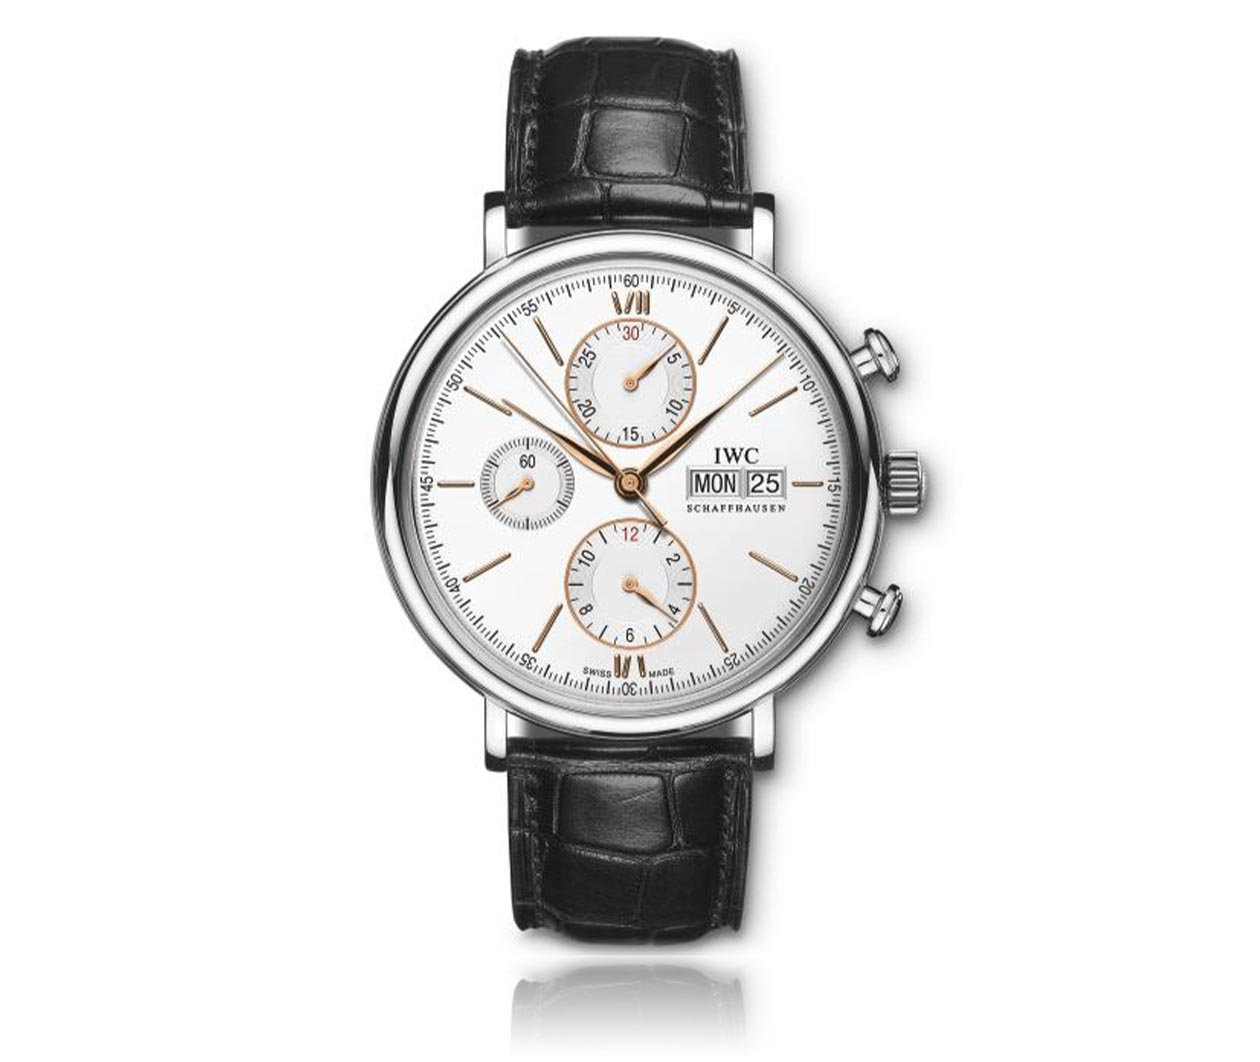 IWC Portofino Chronograph IW391031 Flatlay FINAL